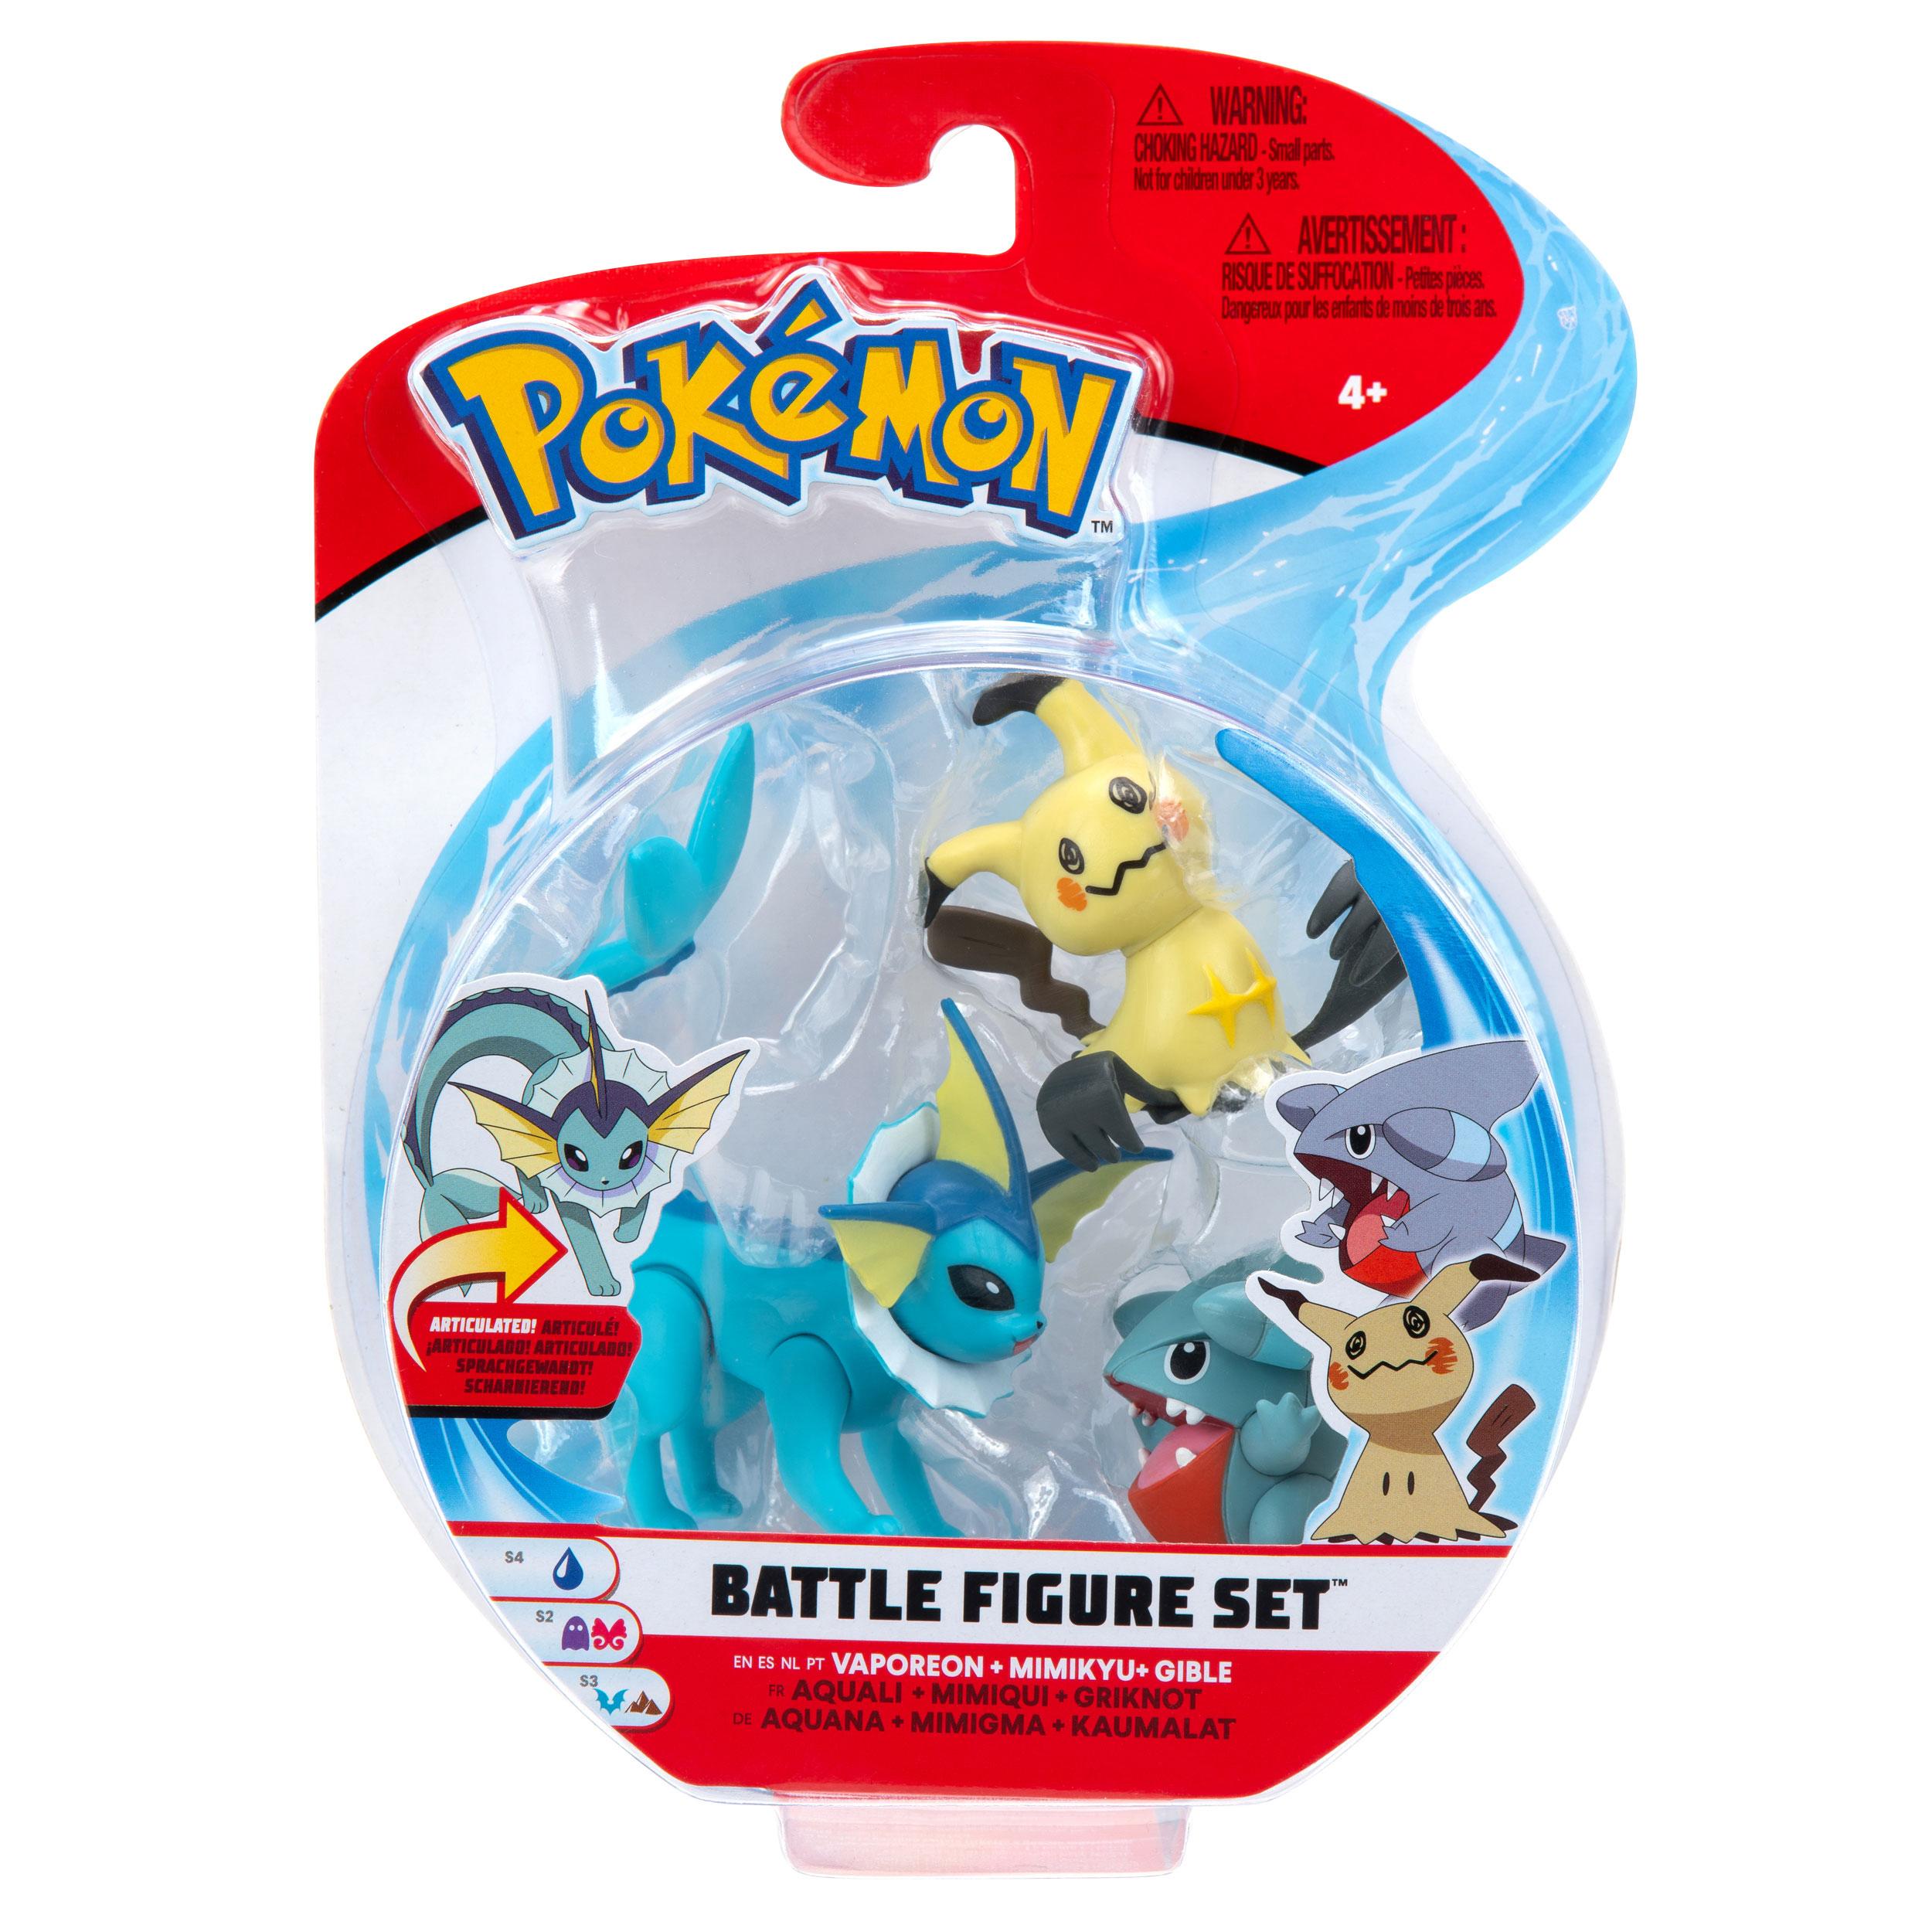 Pokémon - Battle Figure Set - Kaumalat, Mimigma & Aquana